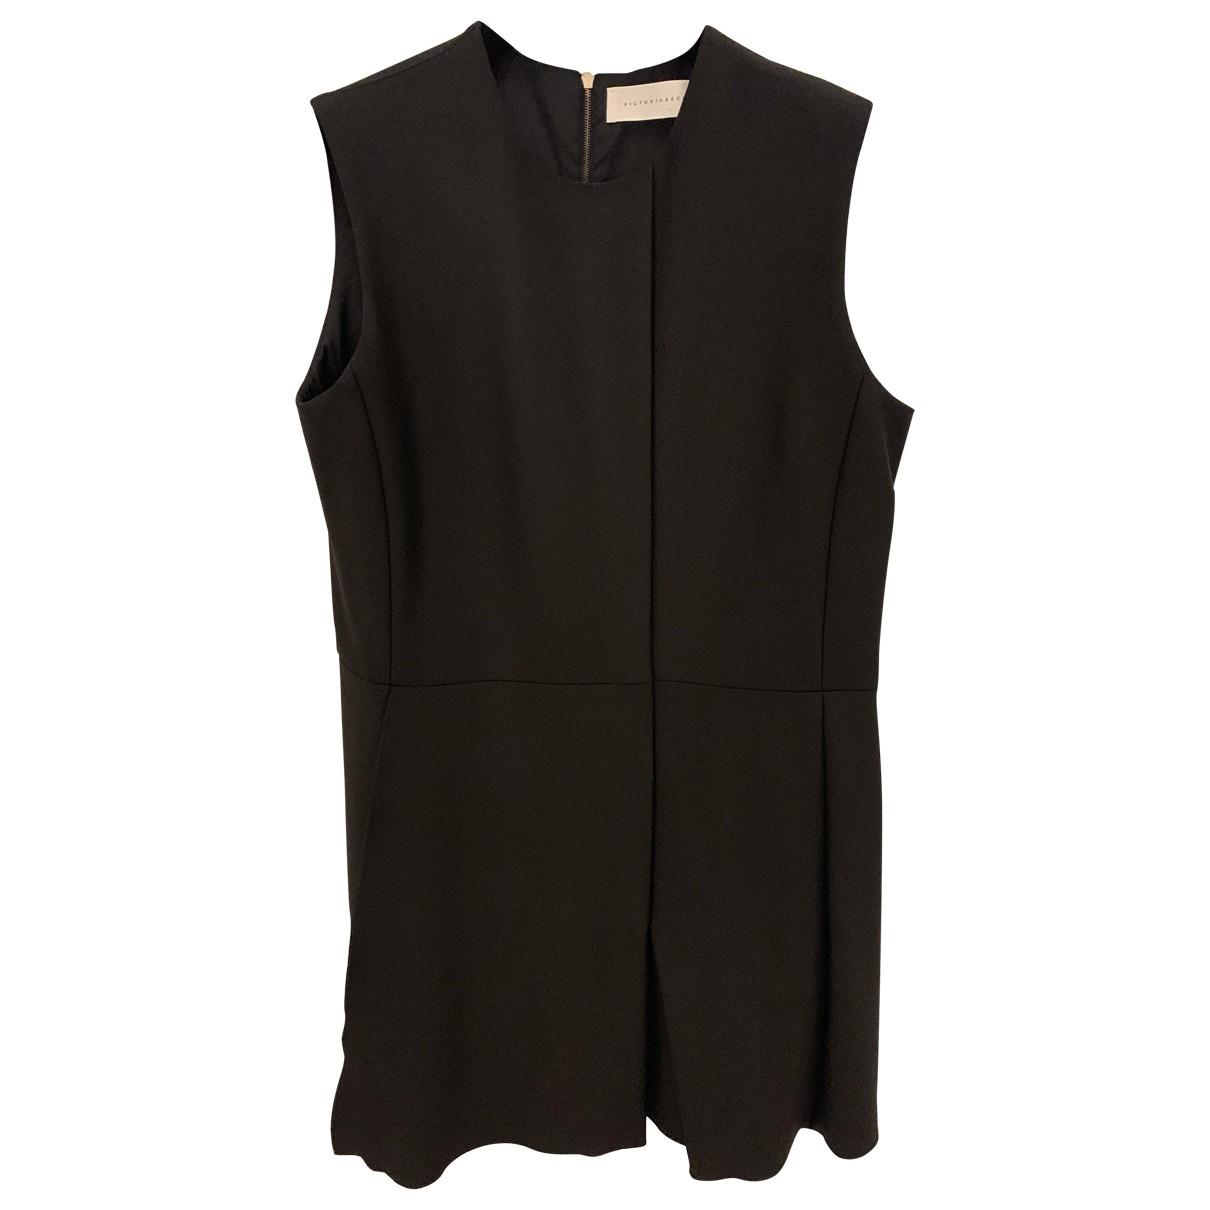 Victoria Beckham \N Black dress for Women 10 UK